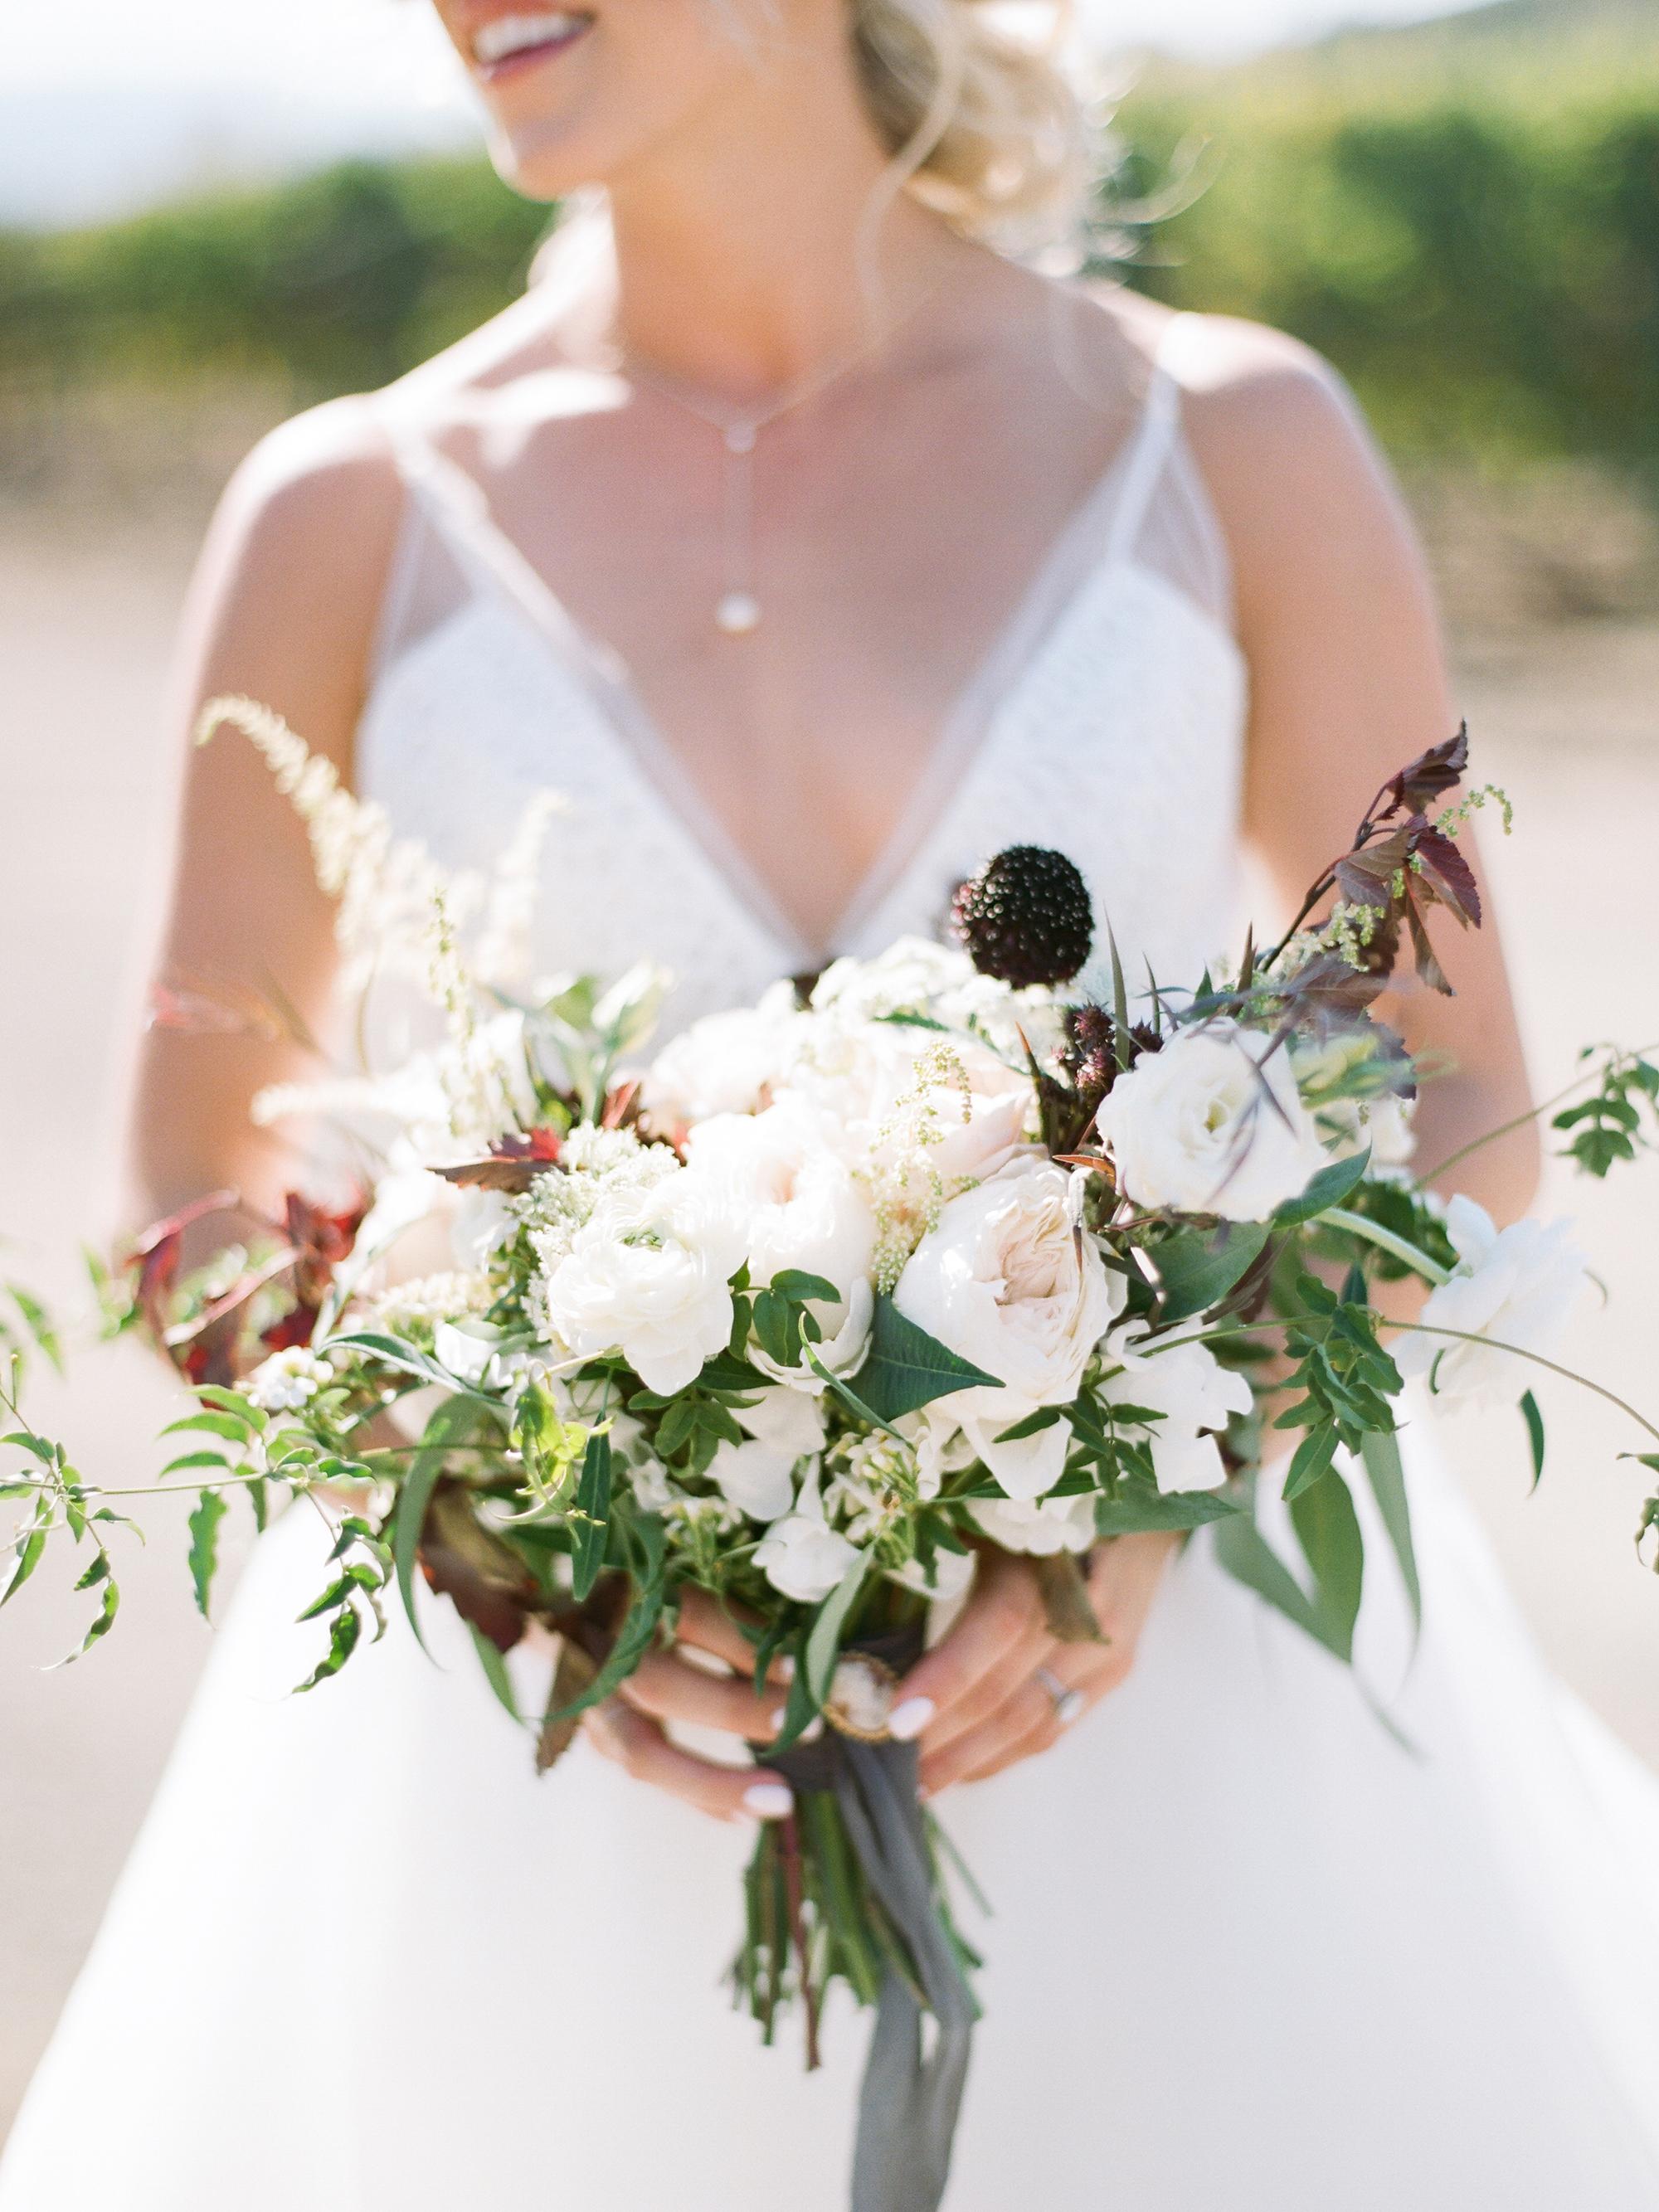 kiersten ruairi wedding bouquet